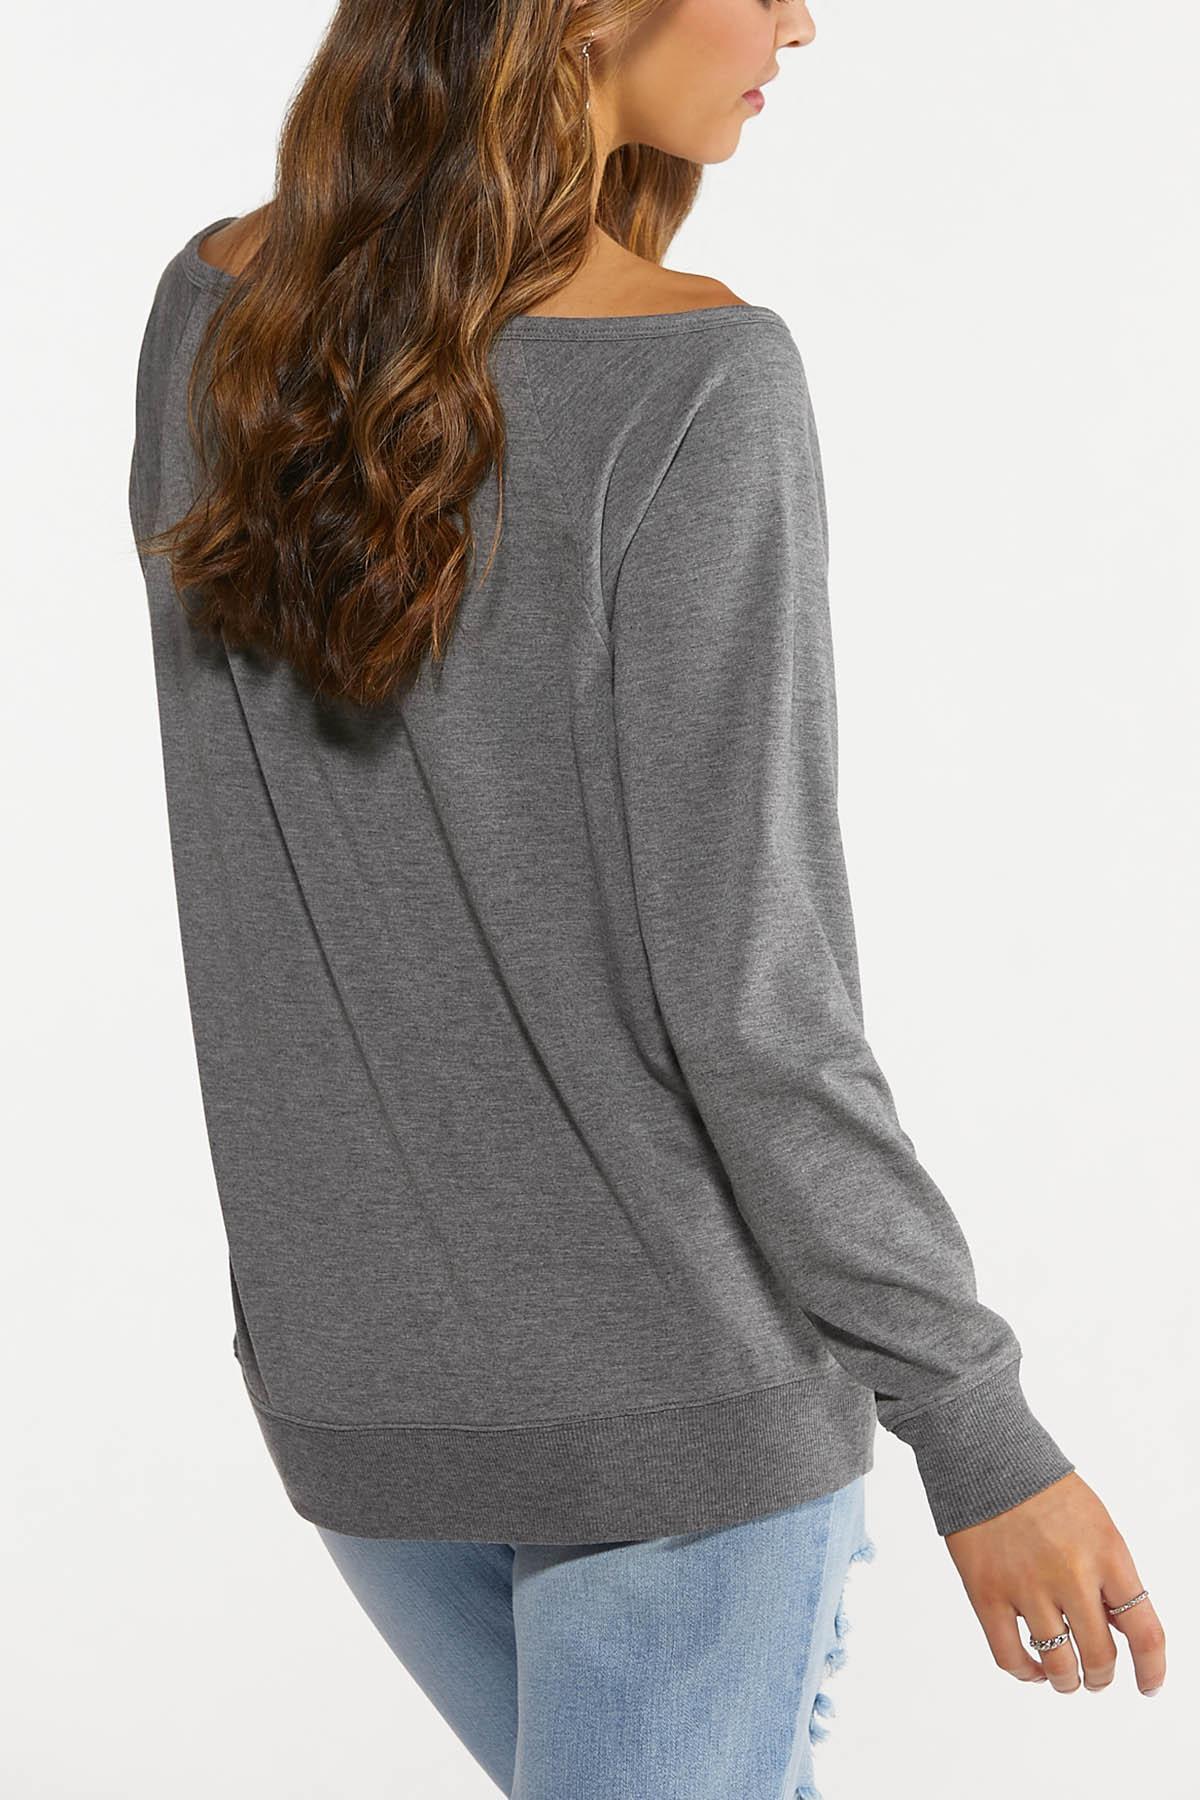 Slouch Football Sweatshirt (Item #44688084)